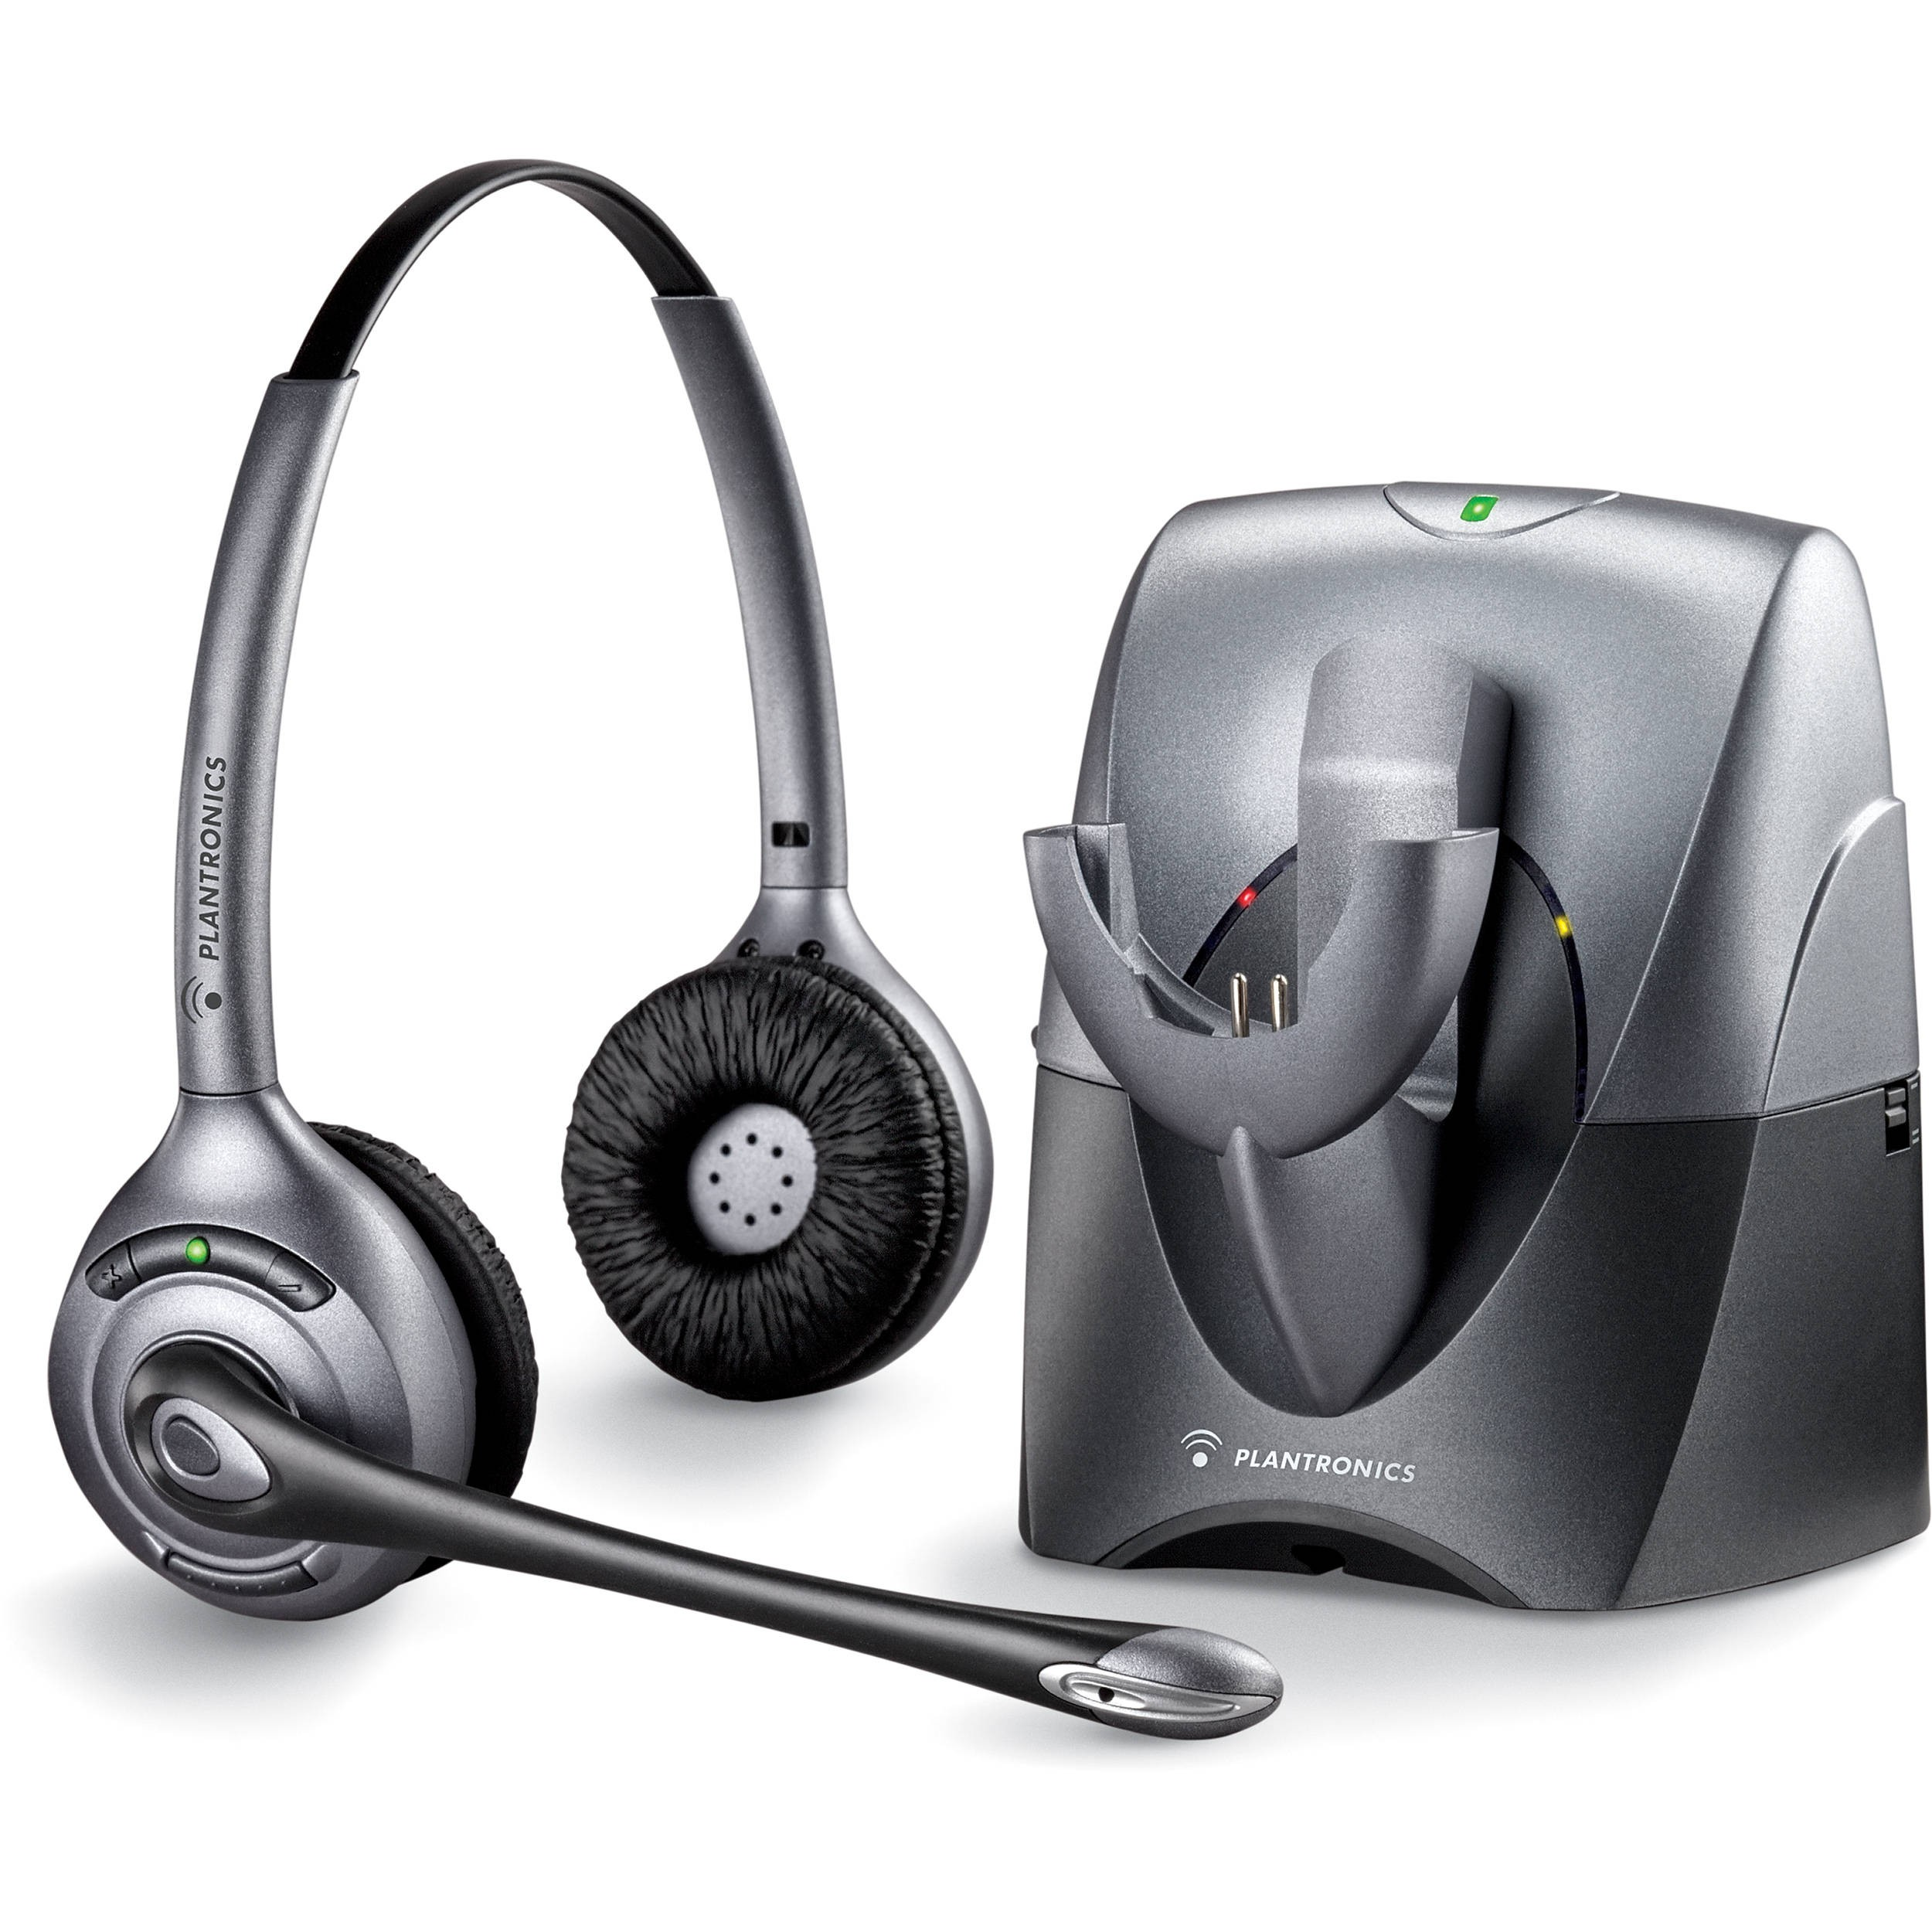 Plantronics CS361N (Binaural) DECT Cordless Headset - A GRADE